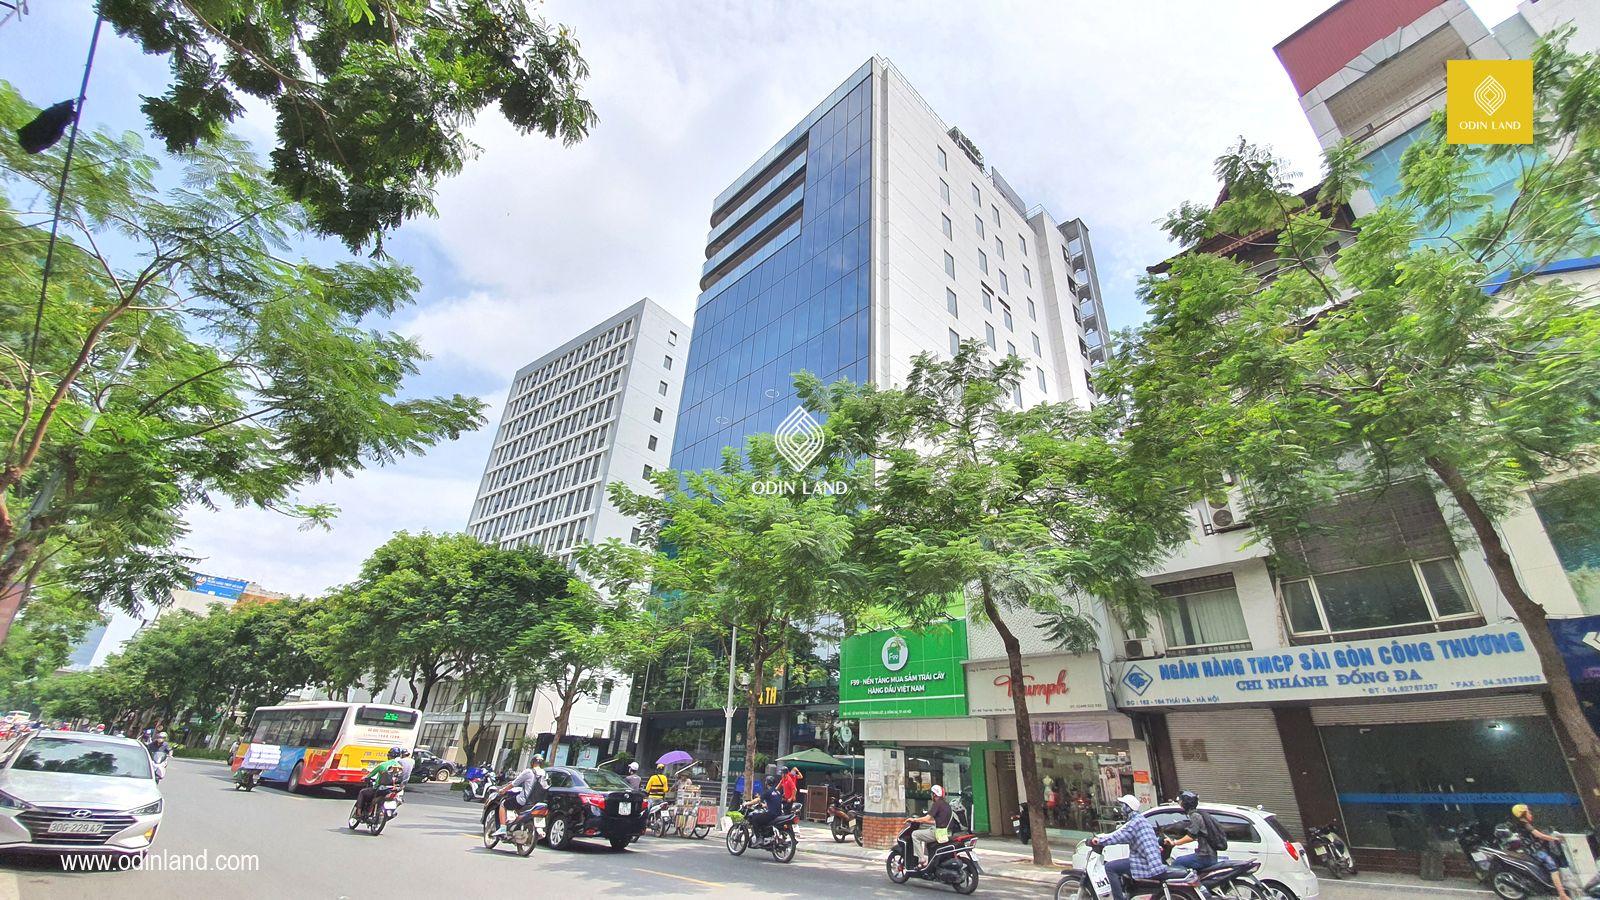 Cho Thue Van Phong Toa Nha Ttg Tower9